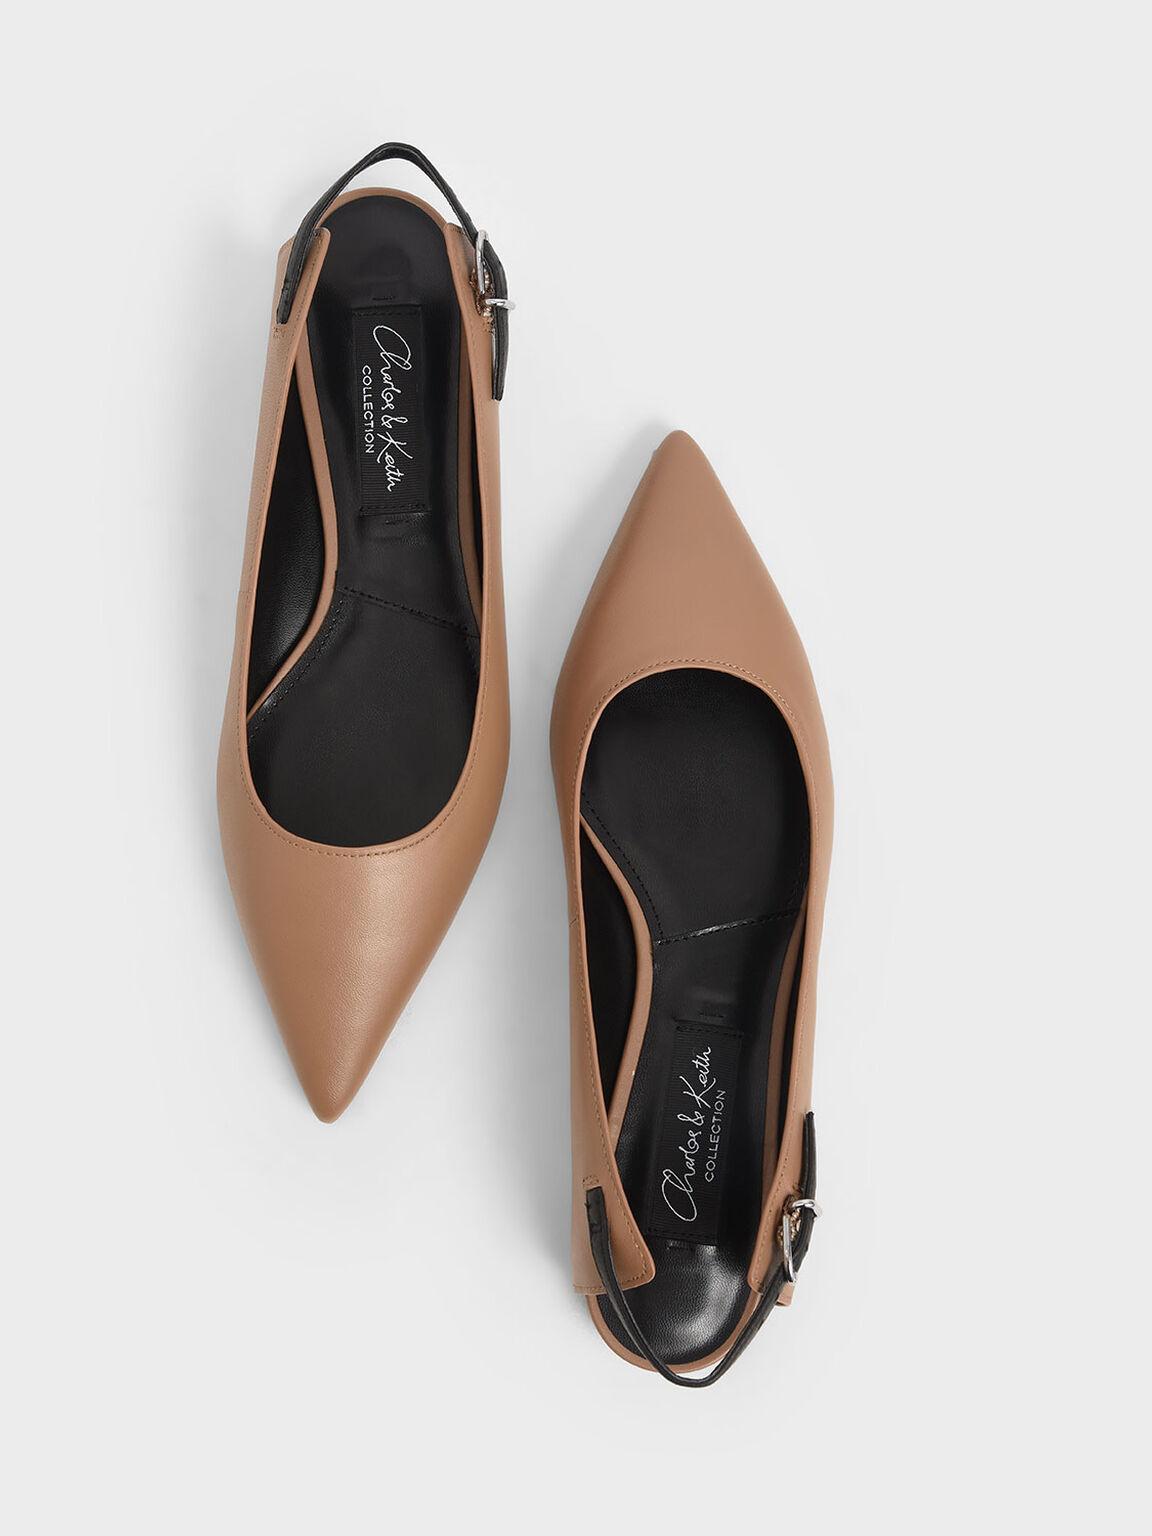 Leather Ballerina Flats, Brown, hi-res